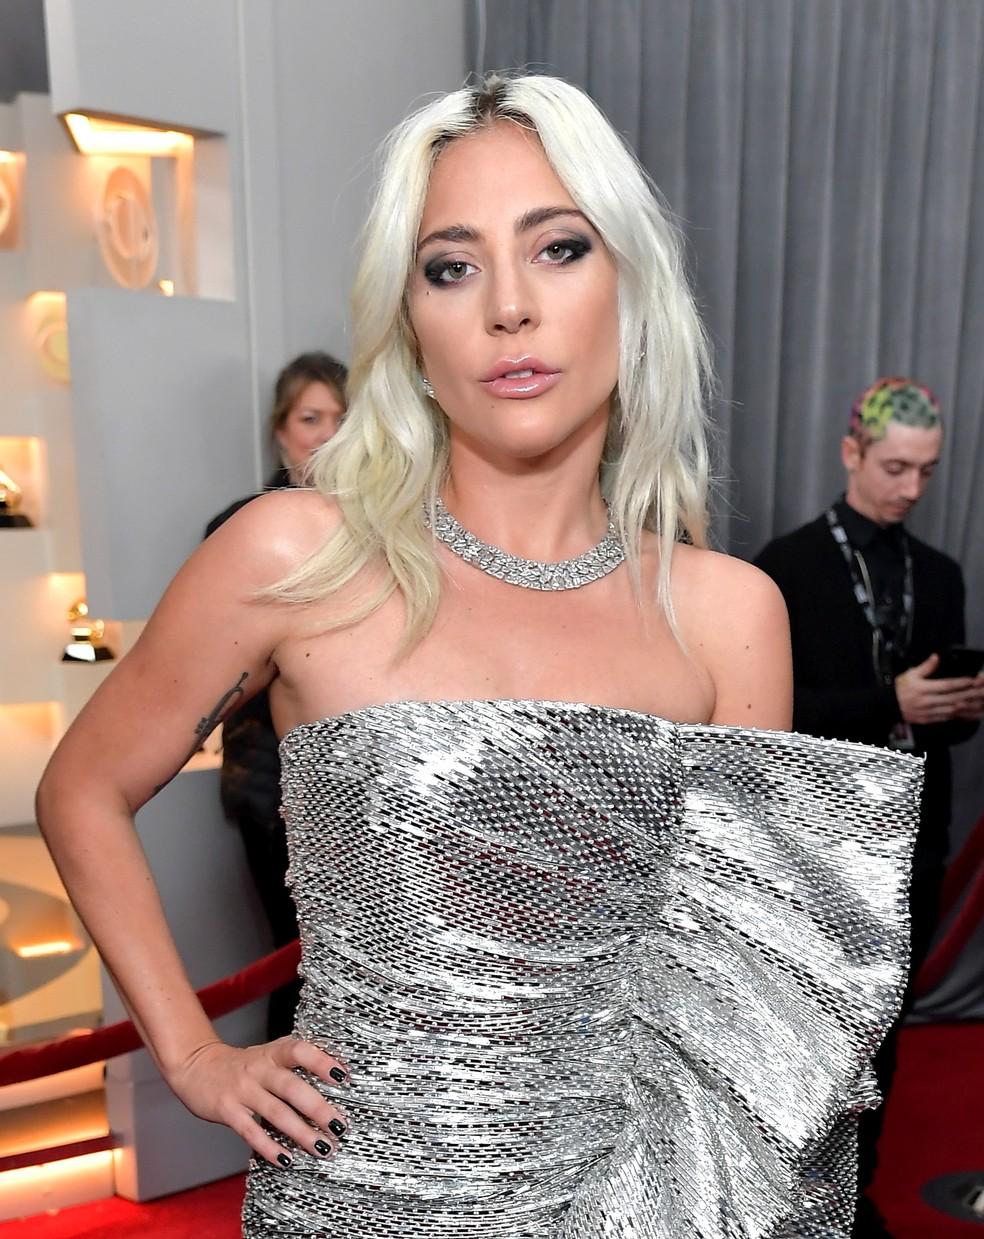 f2a4404d4 ... A cantora Lady Gaga chega para o Grammy 2019, em Los Angeles — Foto: